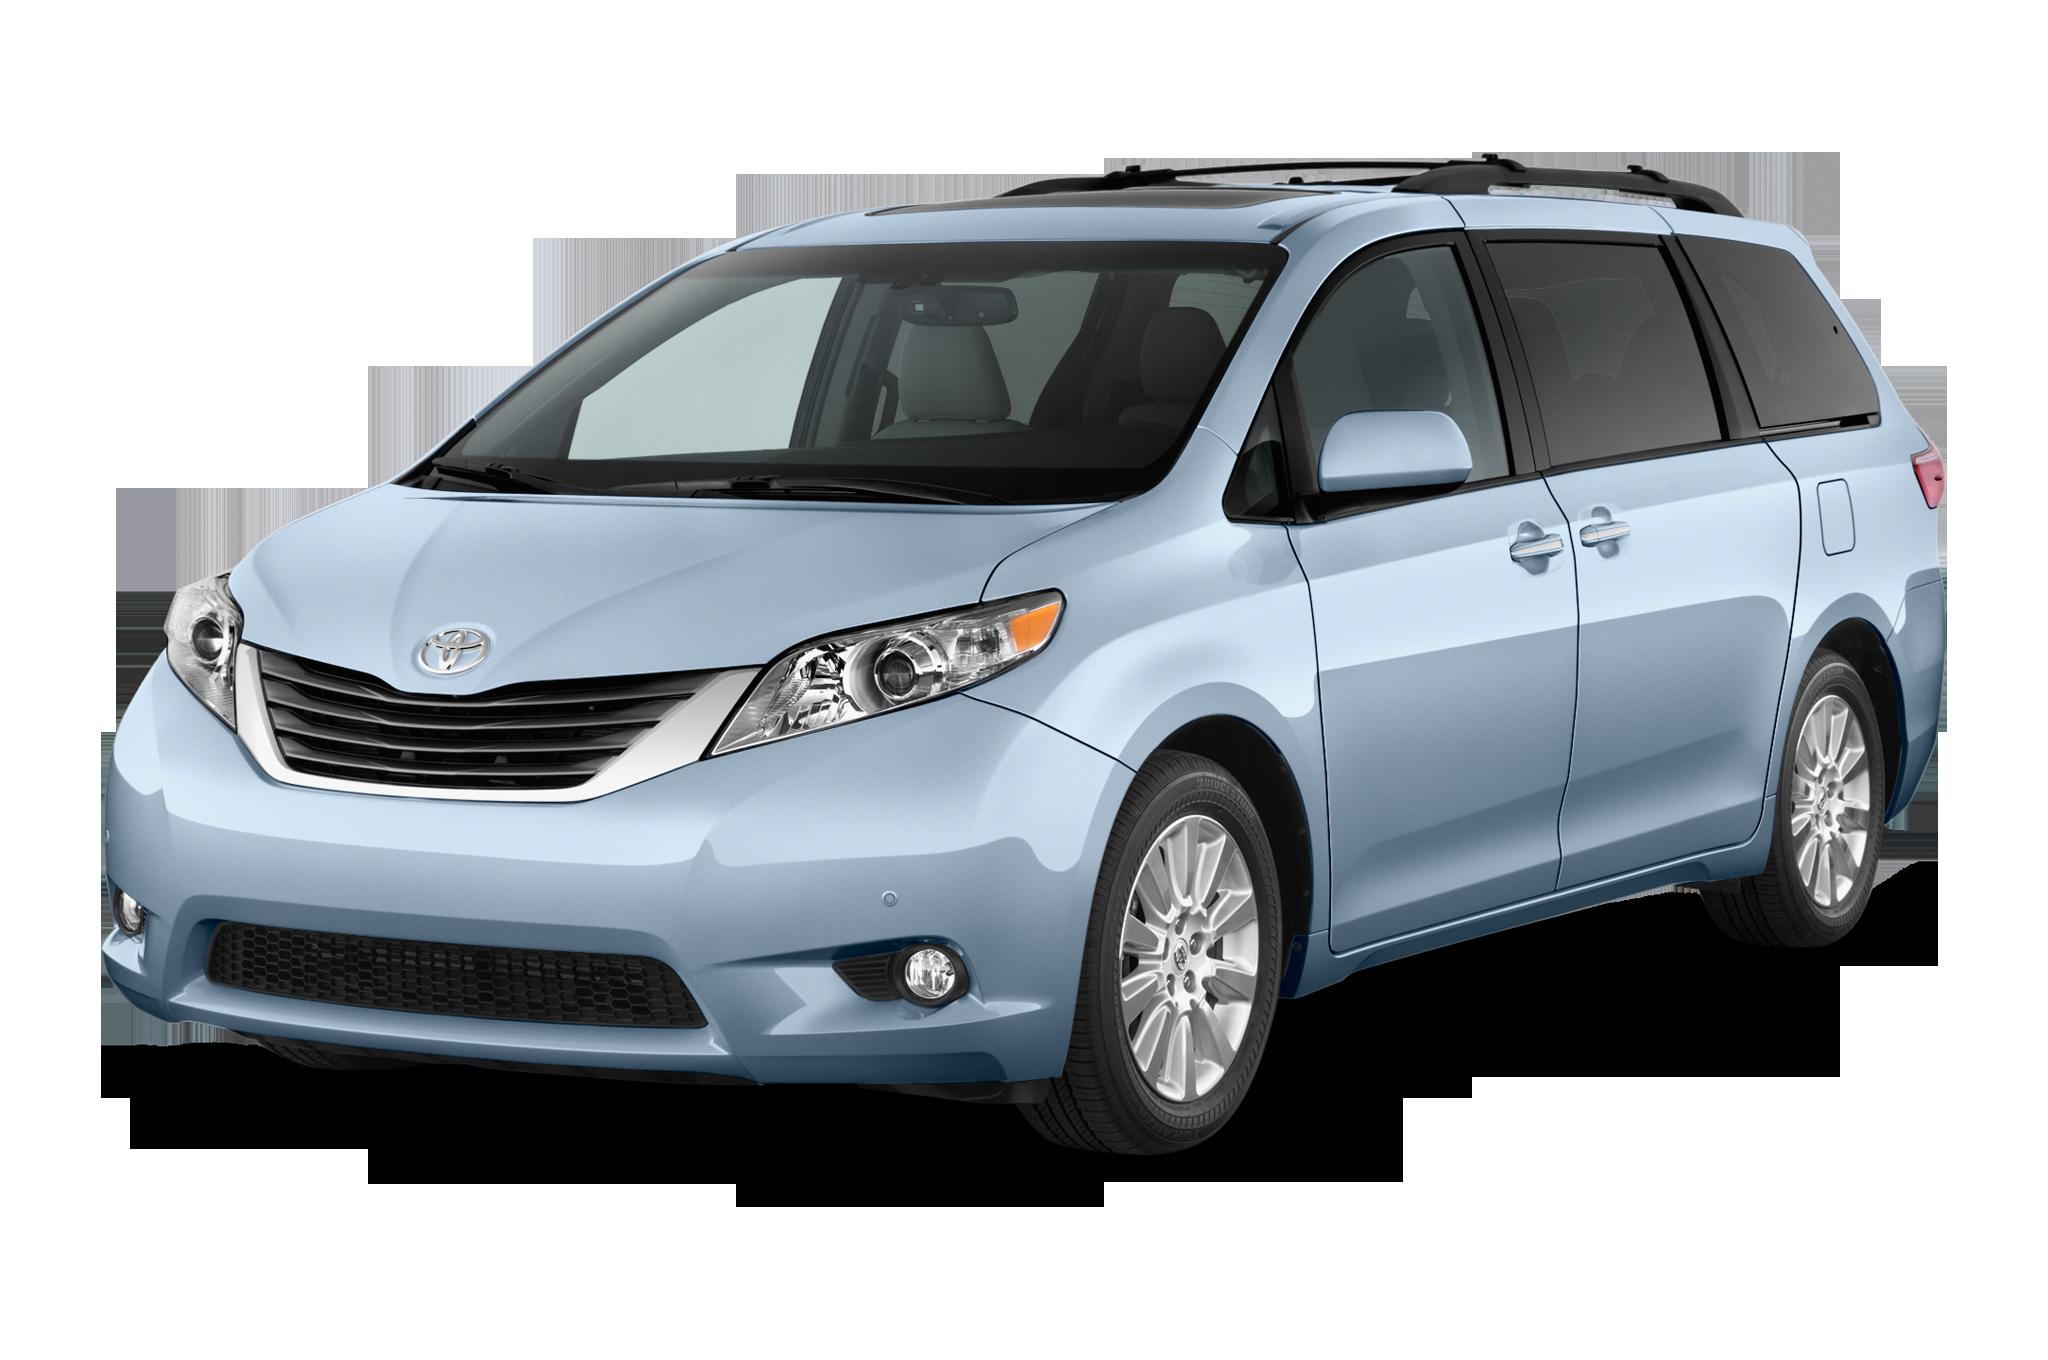 toyota sienna reviews. Minivan clipart passenger